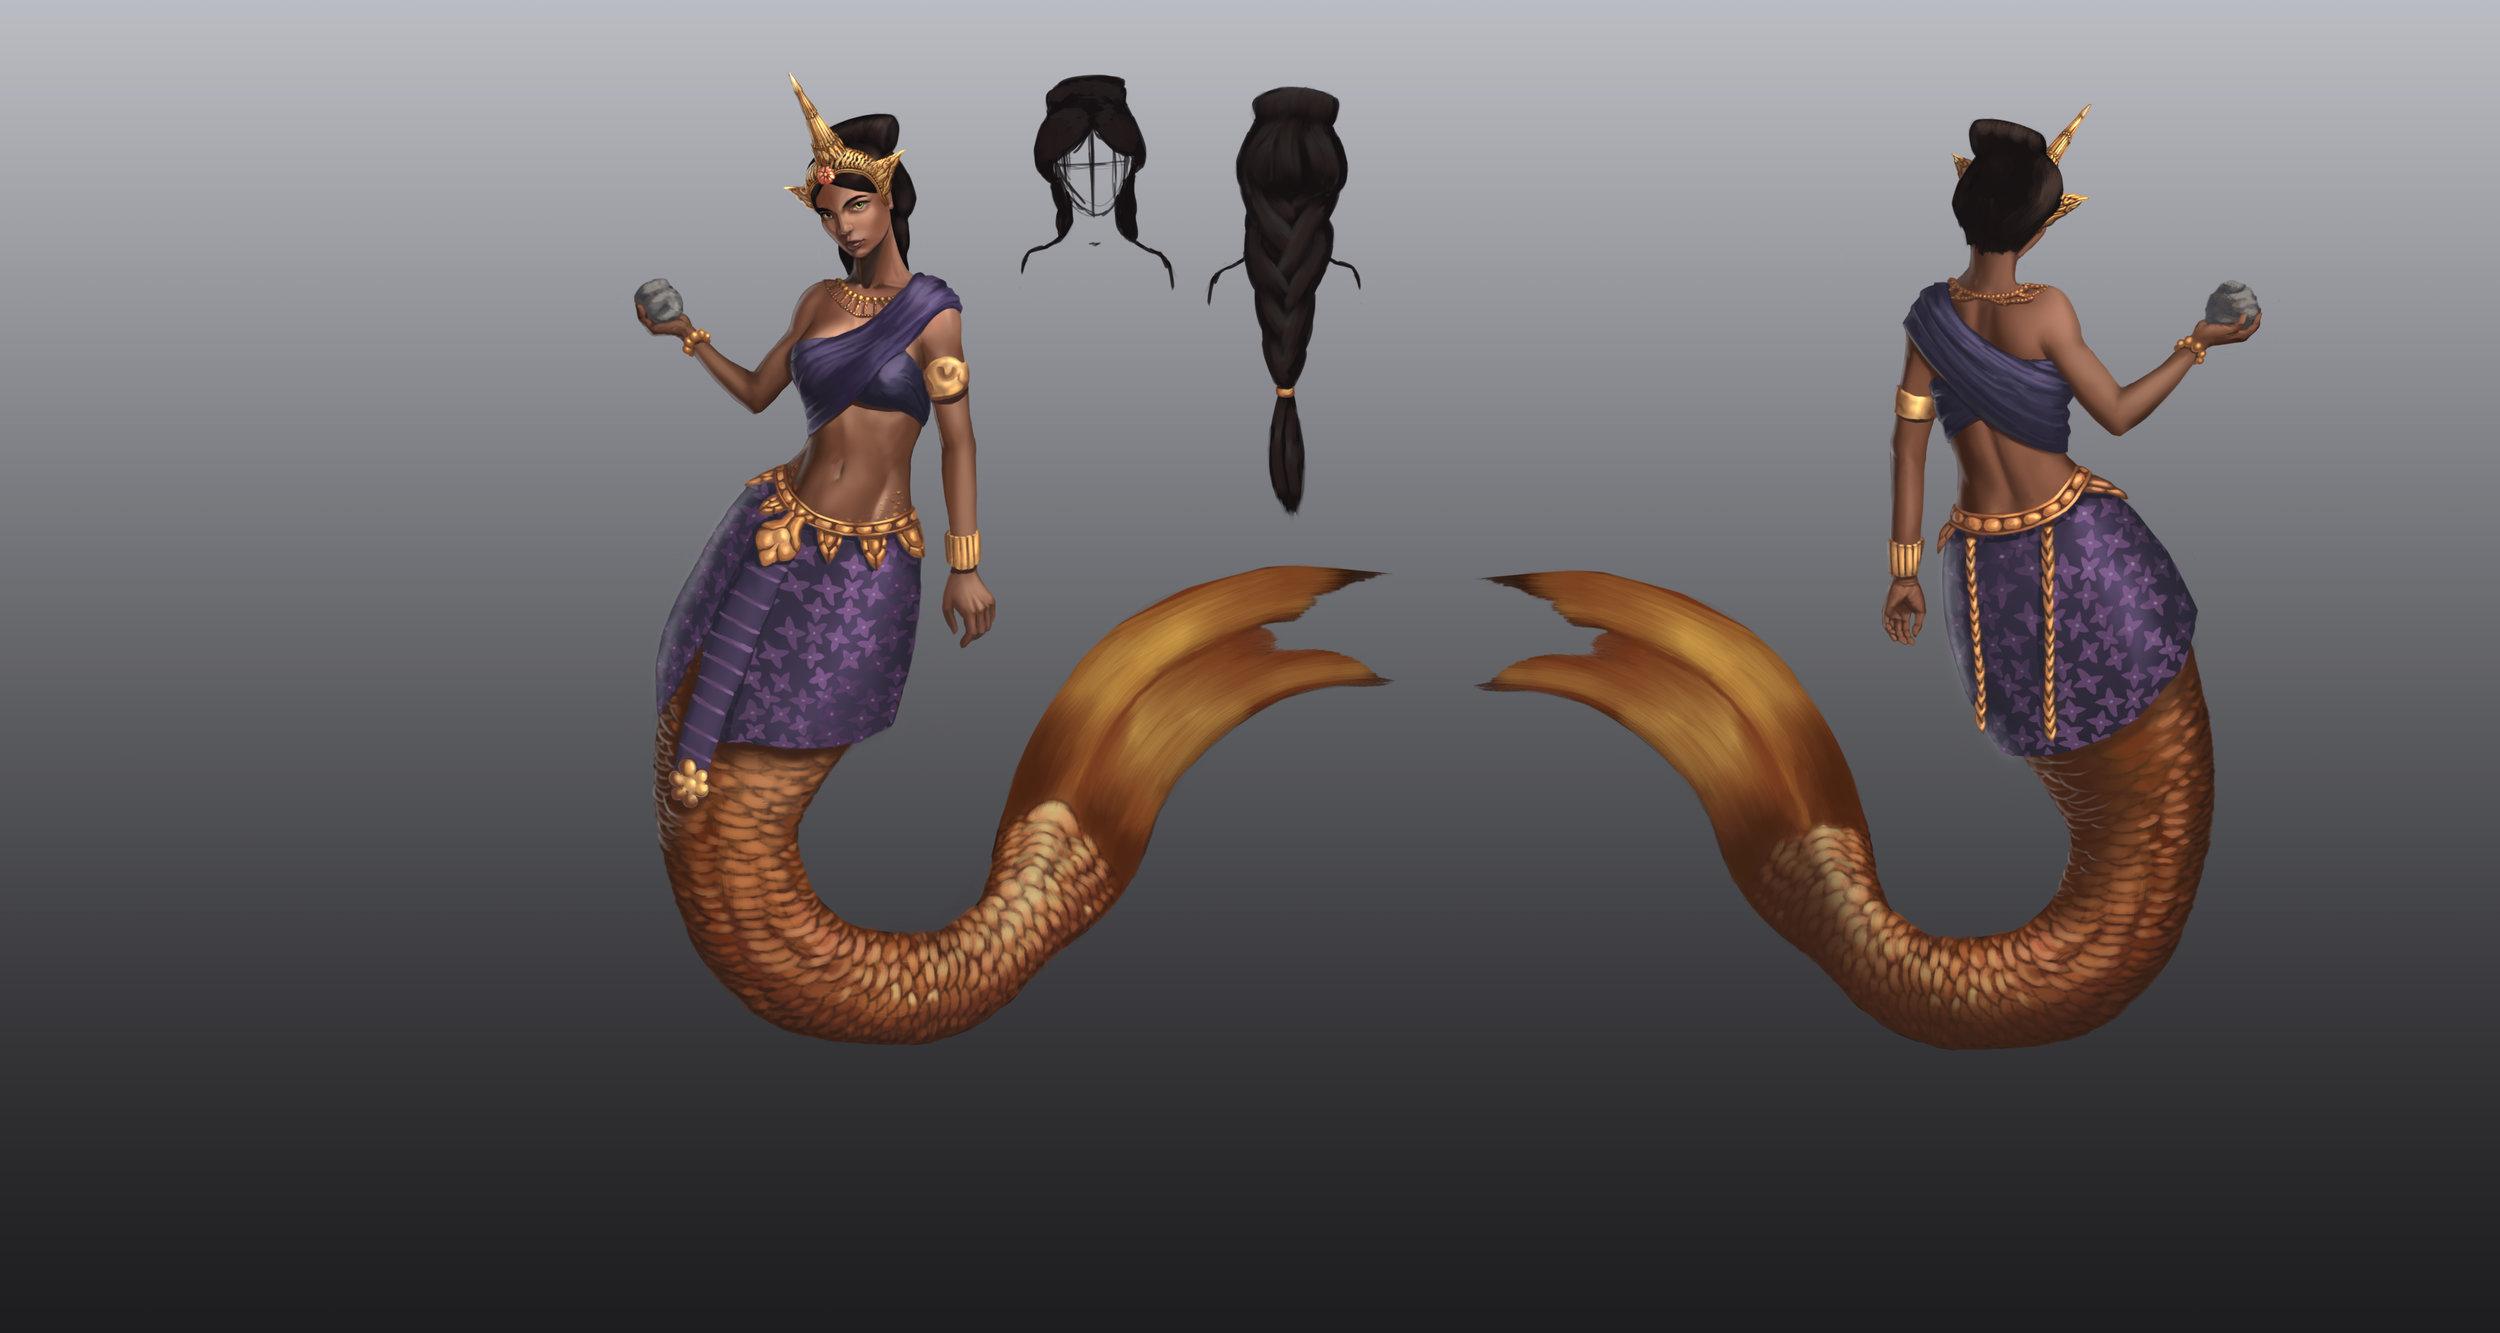 Suvannamaccha the Golden Mermaid